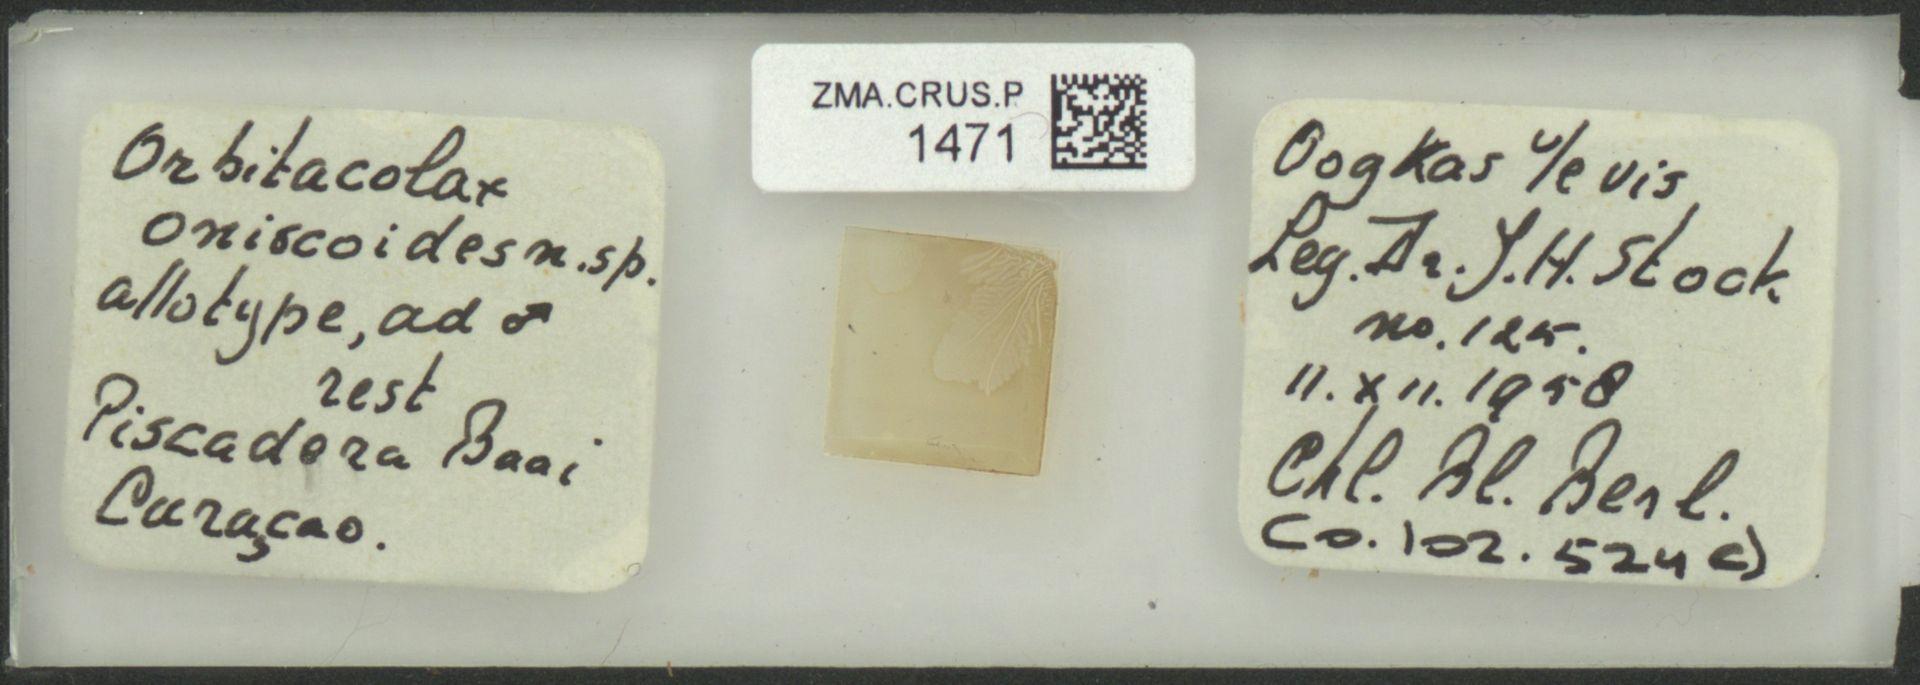 ZMA.CRUS.P.1471 | Orbitocolax oniscoides